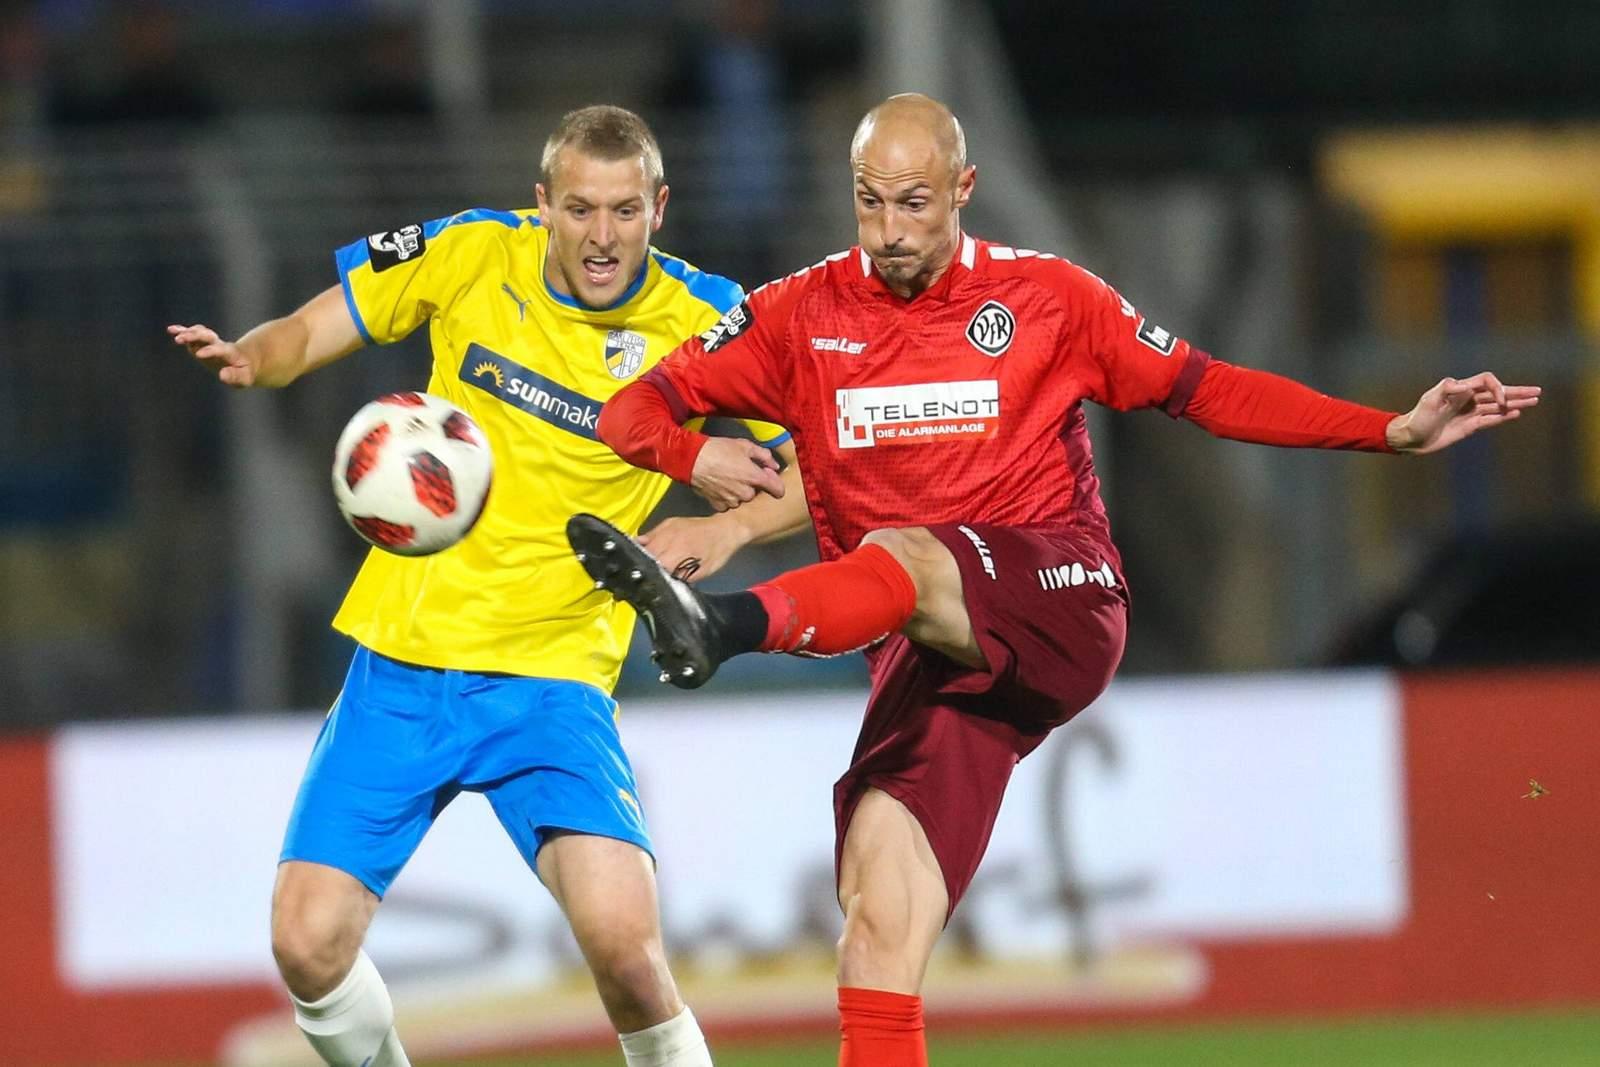 Matthias Morys (r.) gegen Marius Grösch.